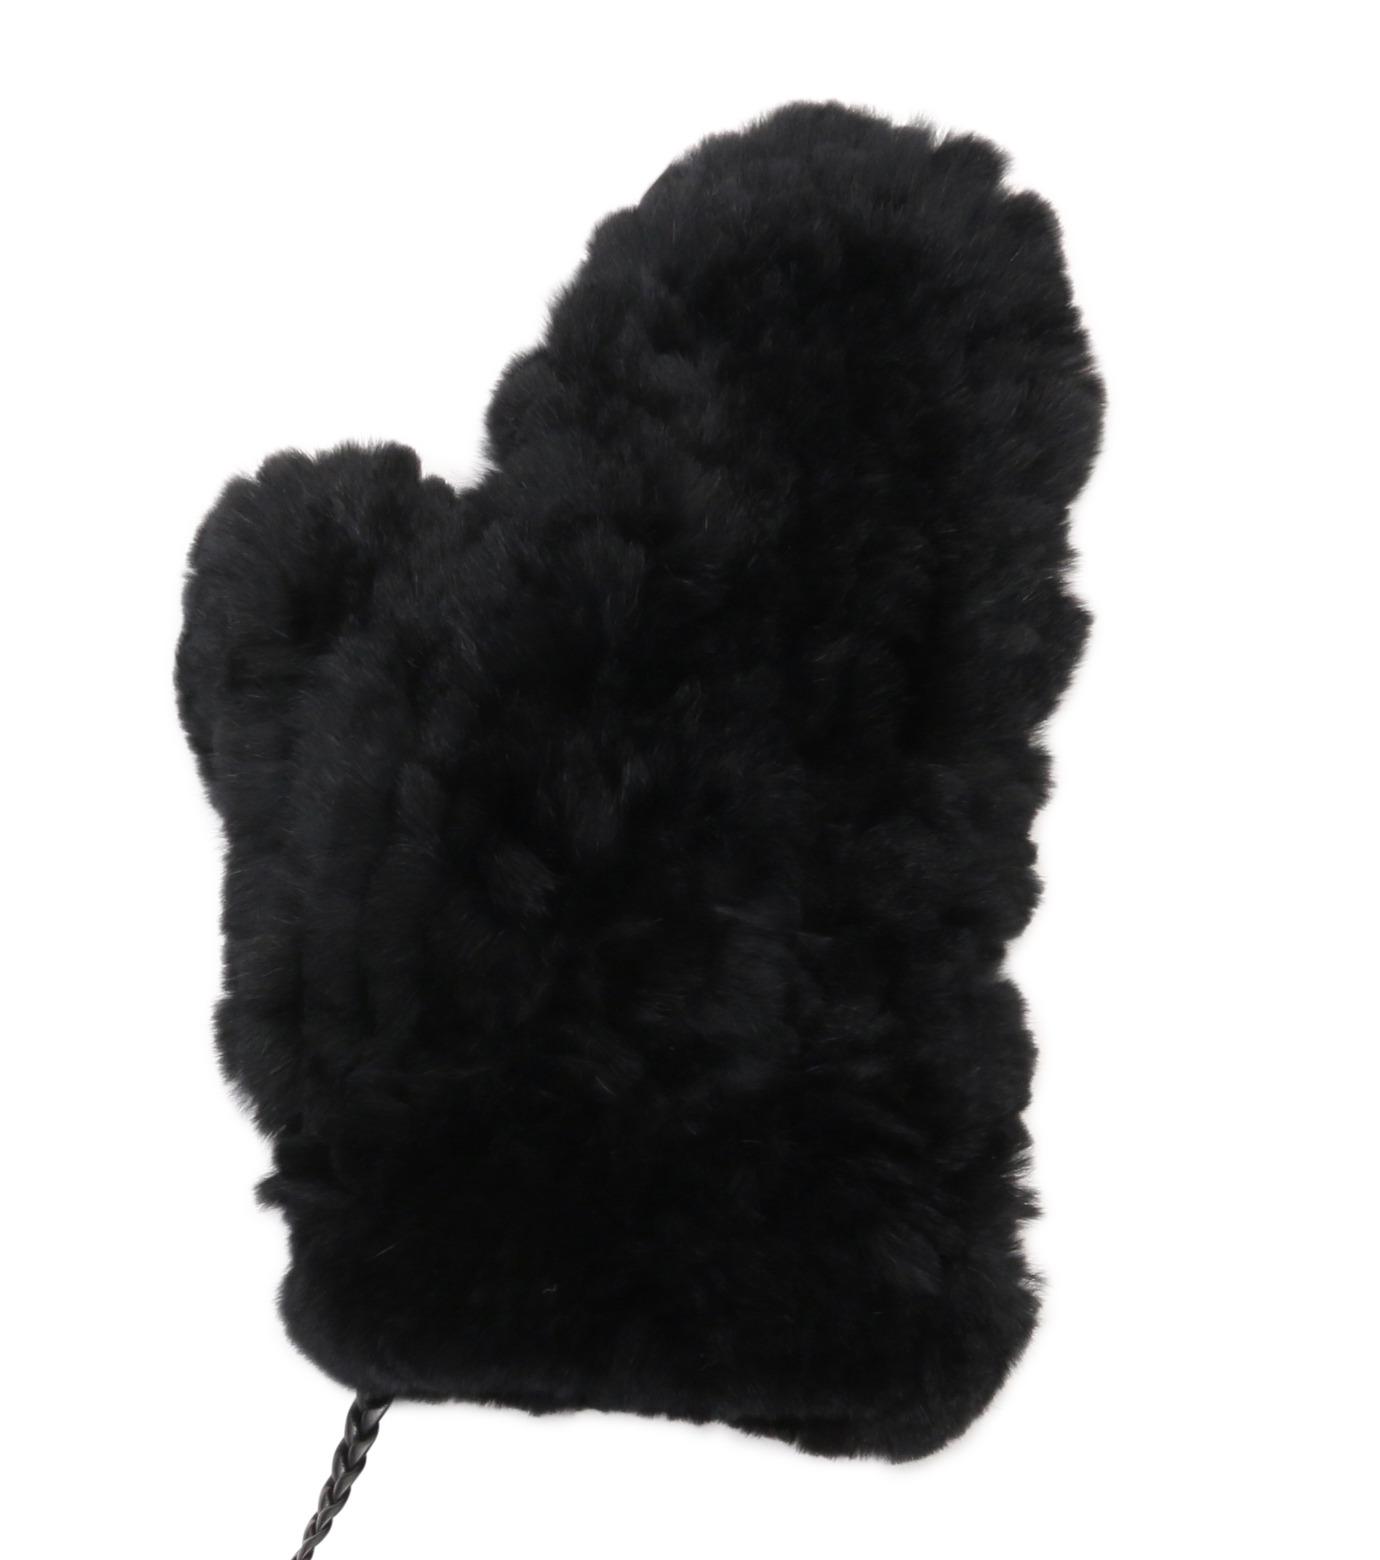 Yves Salomon(イヴ サロモン)のMitten-BLACK(アクセサリー/accessory)-Y5852XXKRE-13 拡大詳細画像2